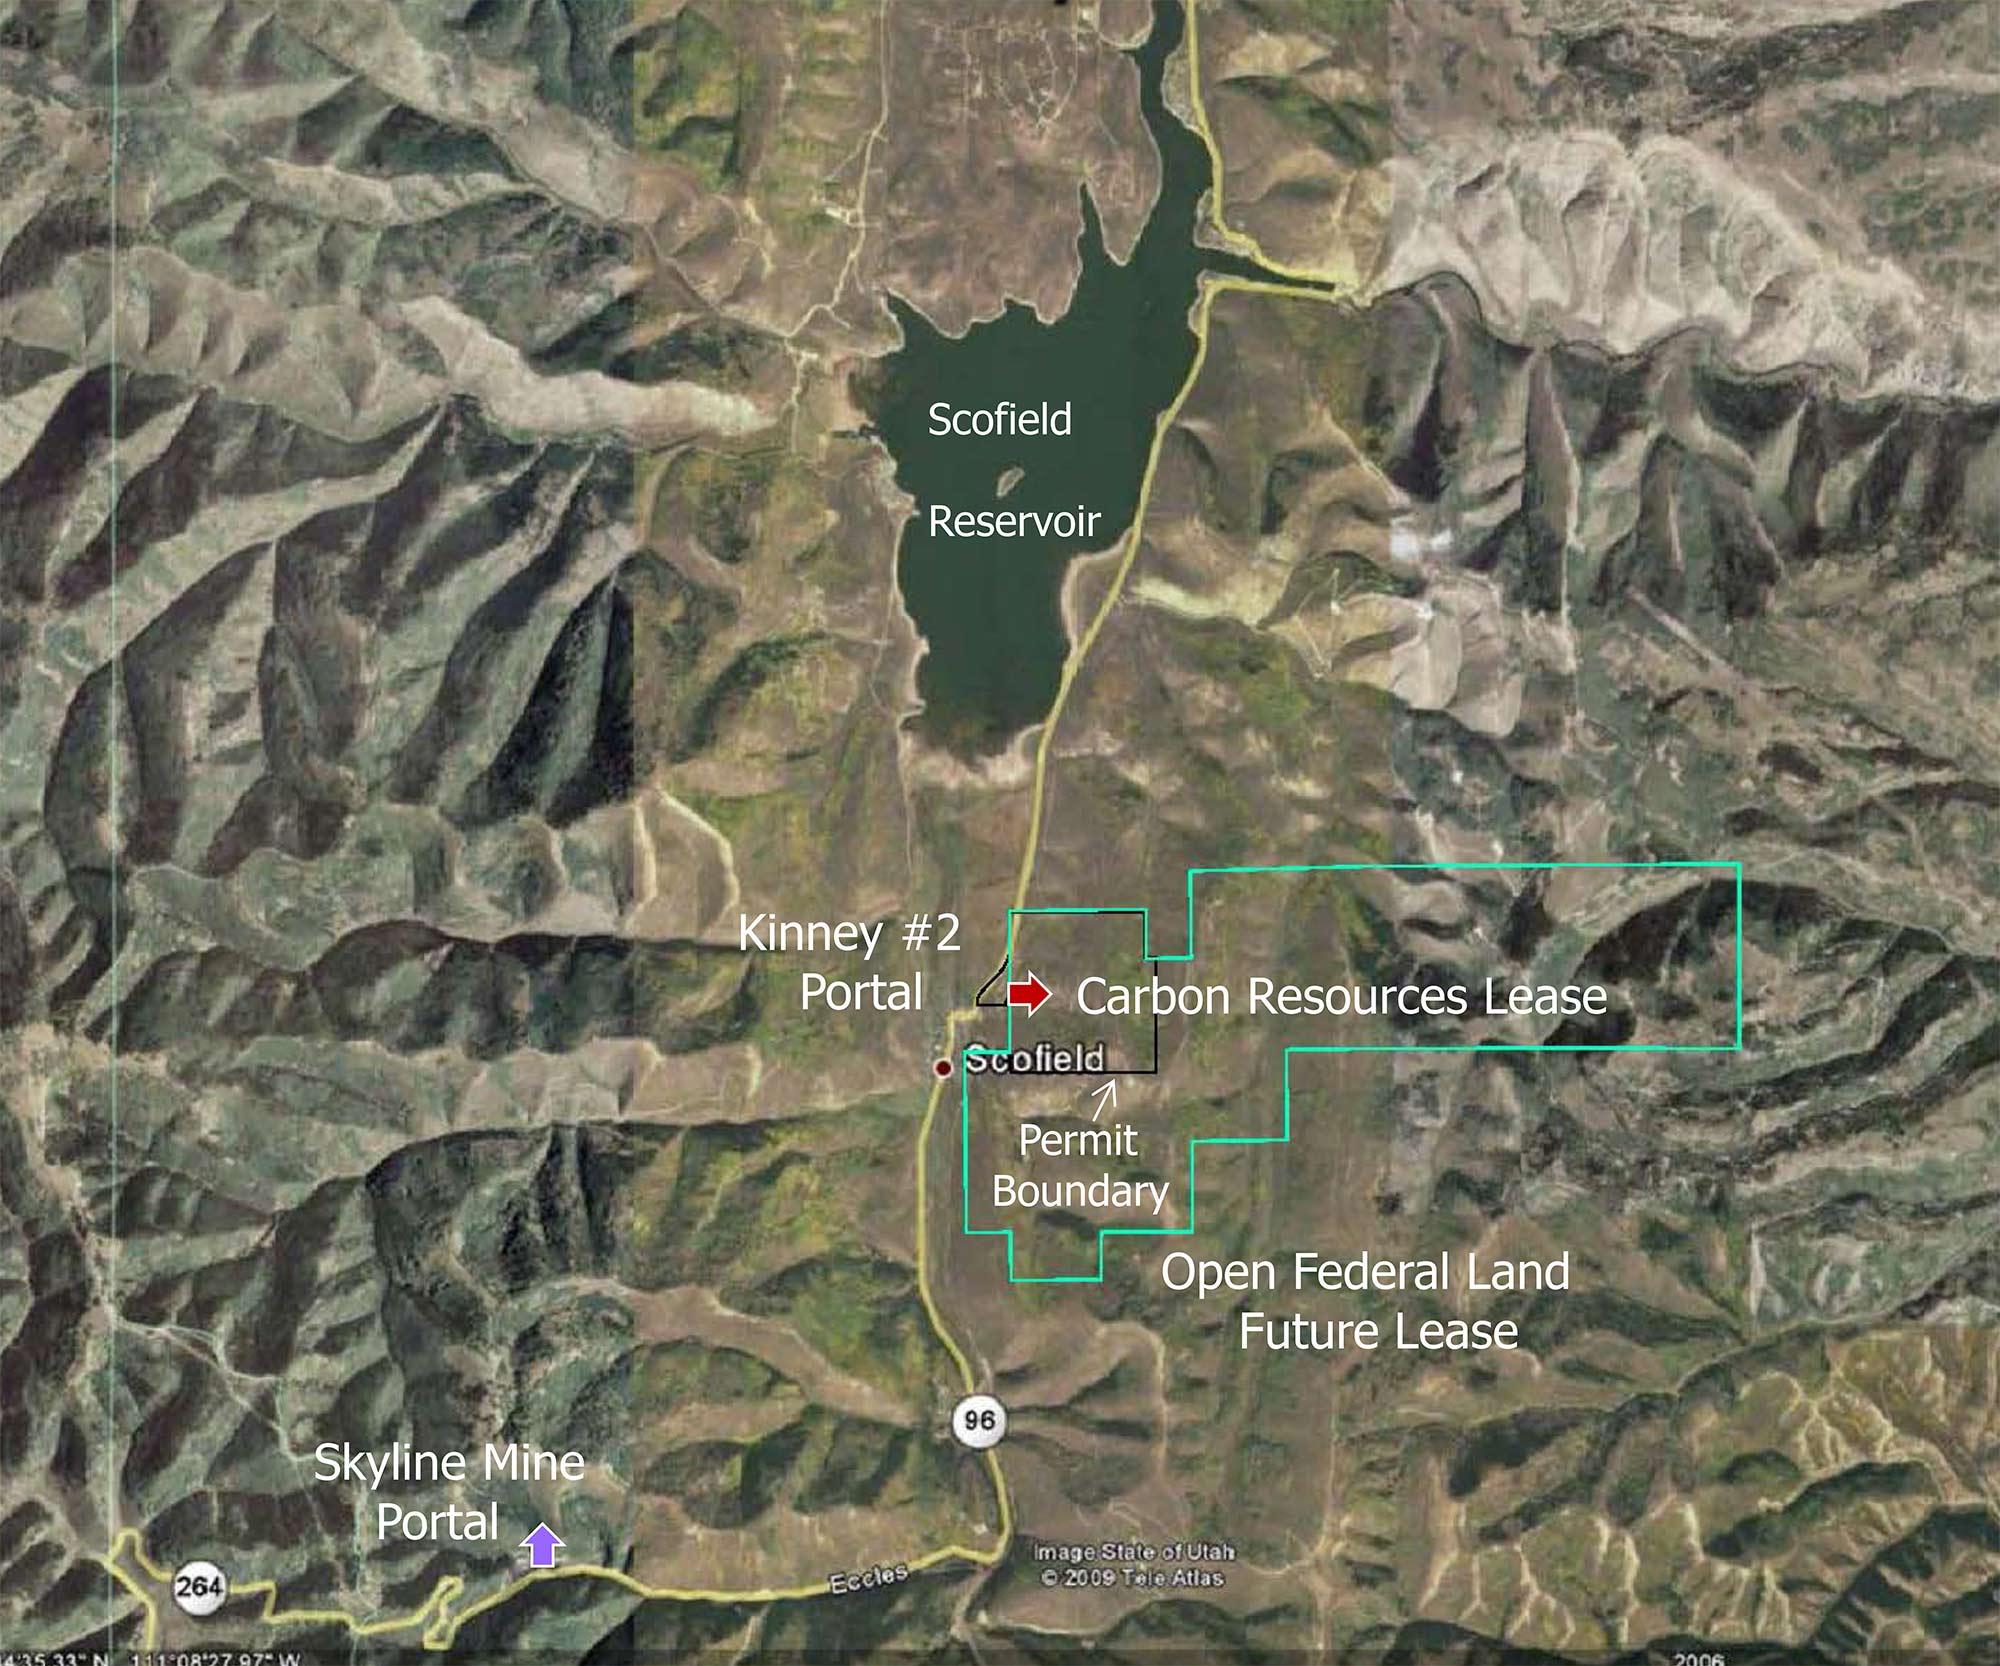 College Of Eastern Utah >> Scofield Area & Kinney #2 Coal (Permitted) - MineListings.com